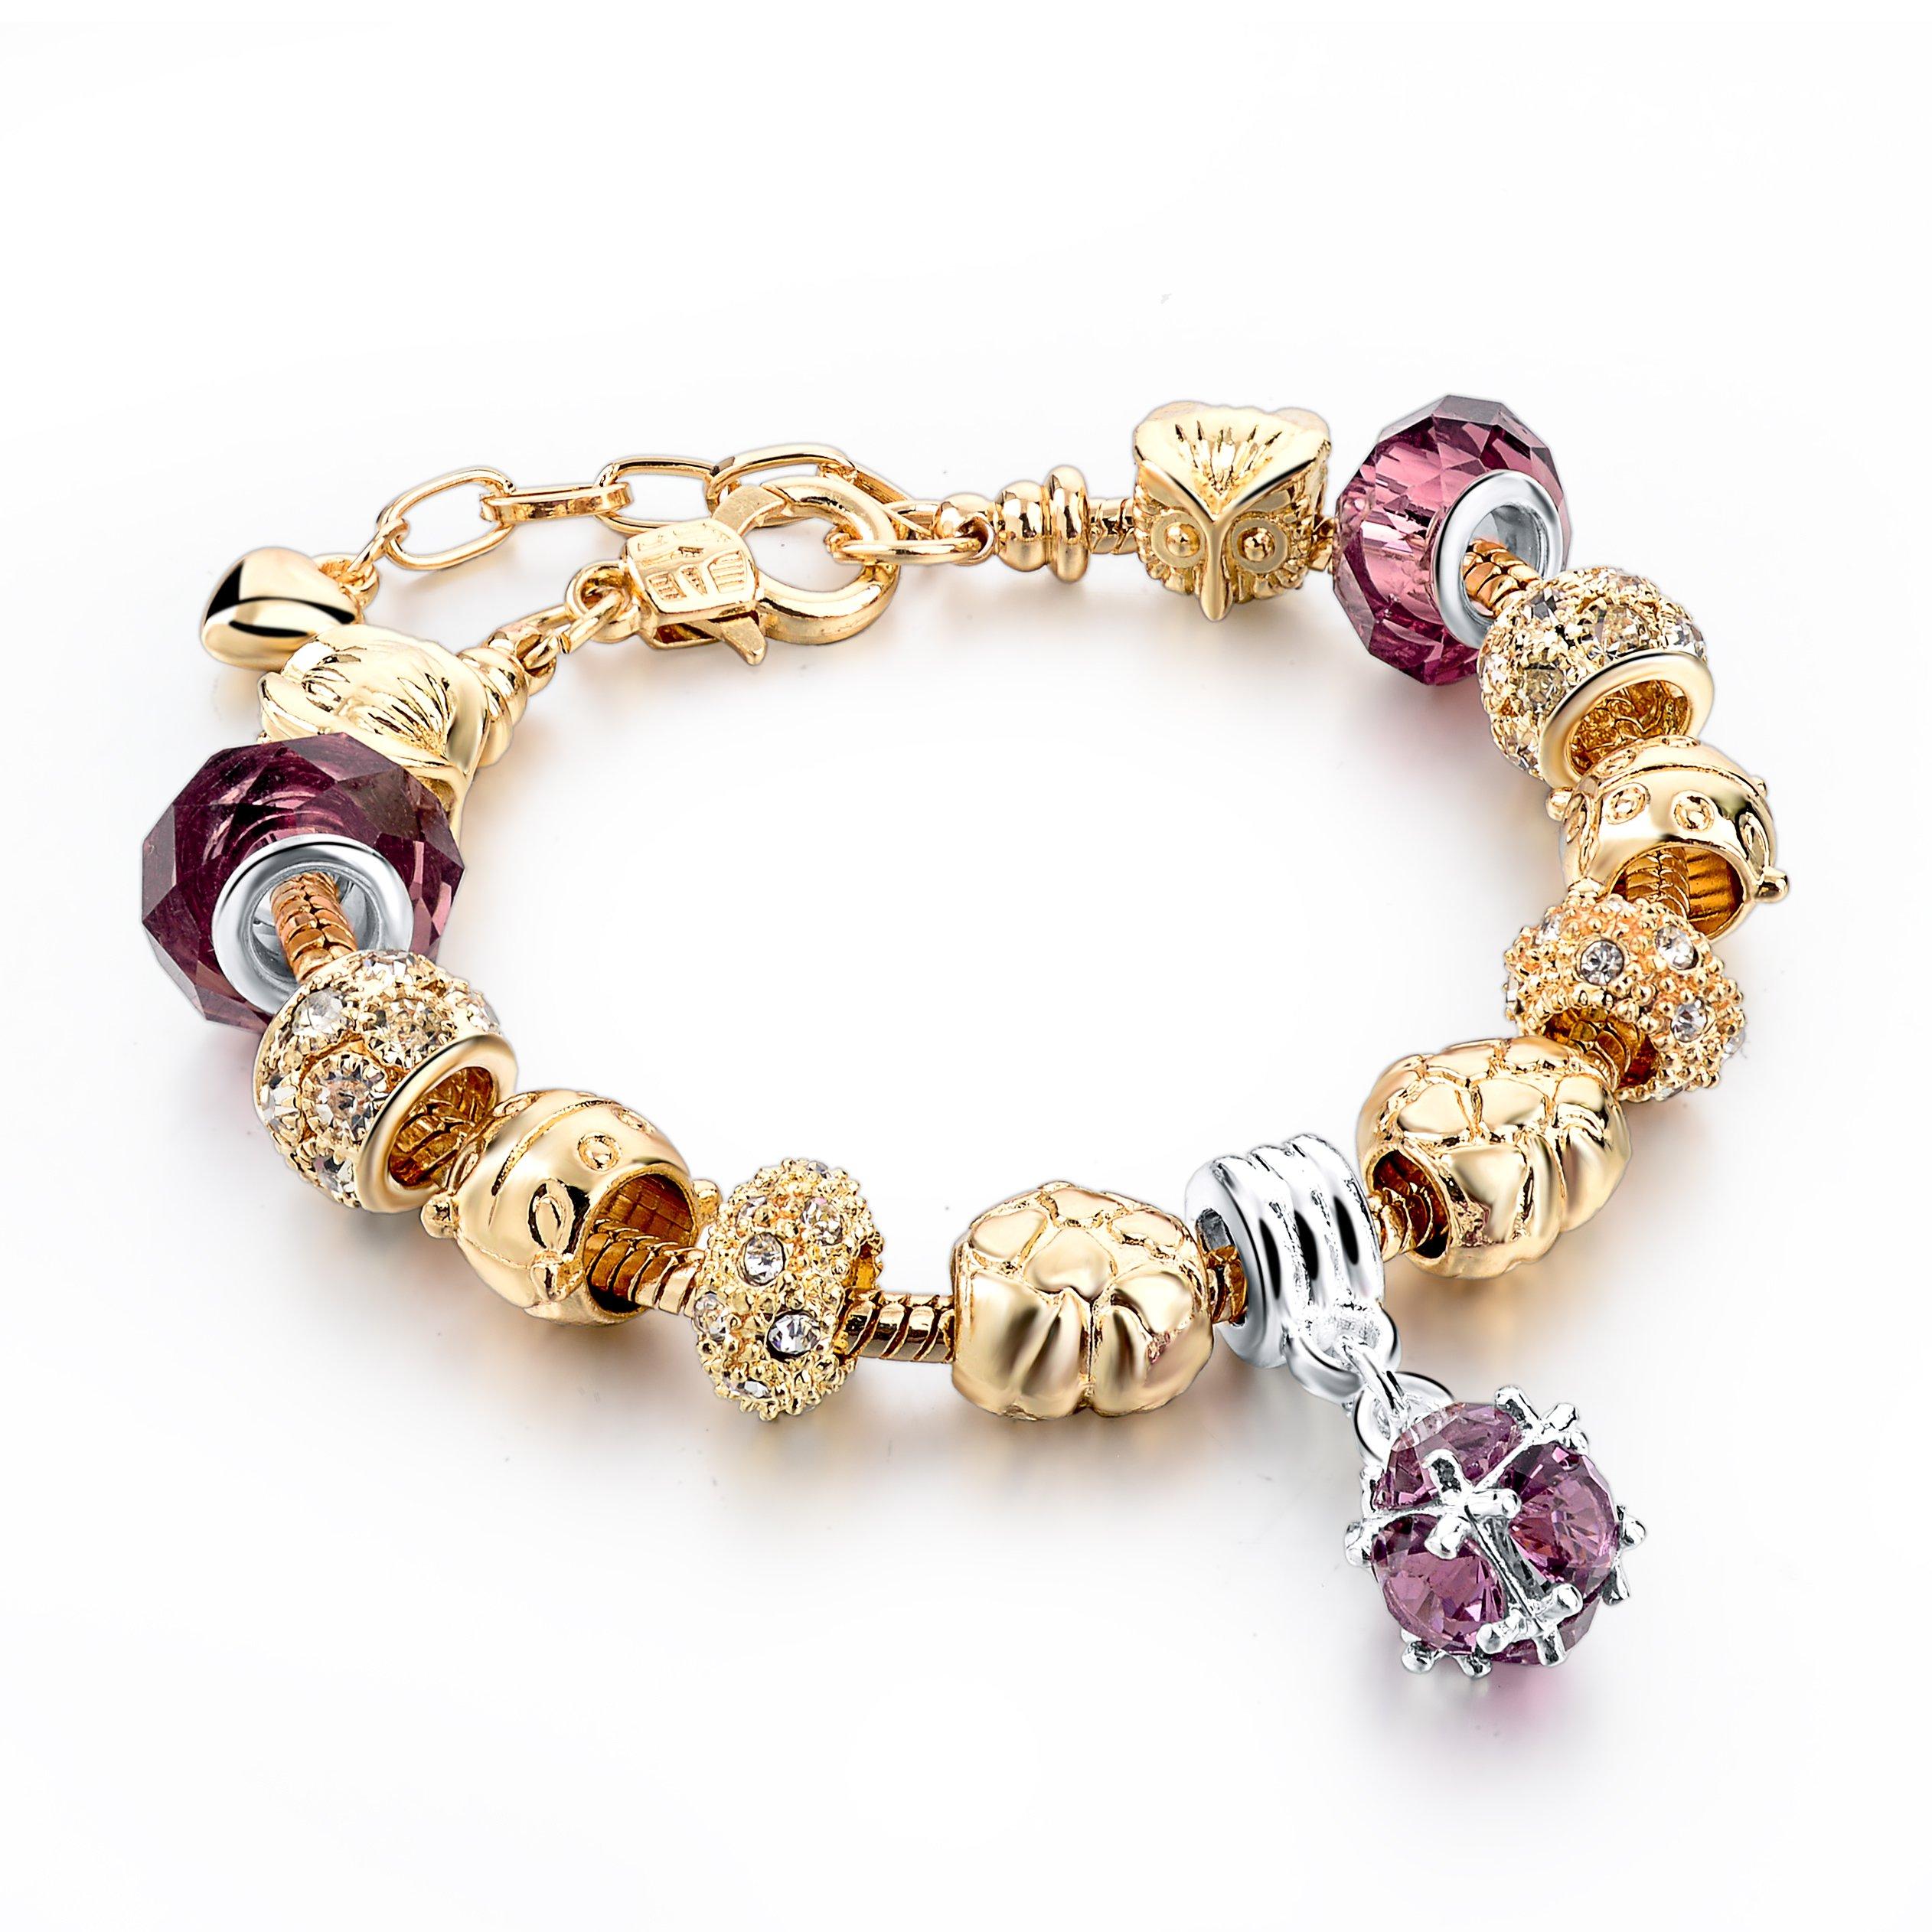 Long Way Gold Plated Snake Chain Bracelet Rhinestone Amethyst Crystal Birthstone Beaded Charm Bracelets Bangles for women Girls at Birthday